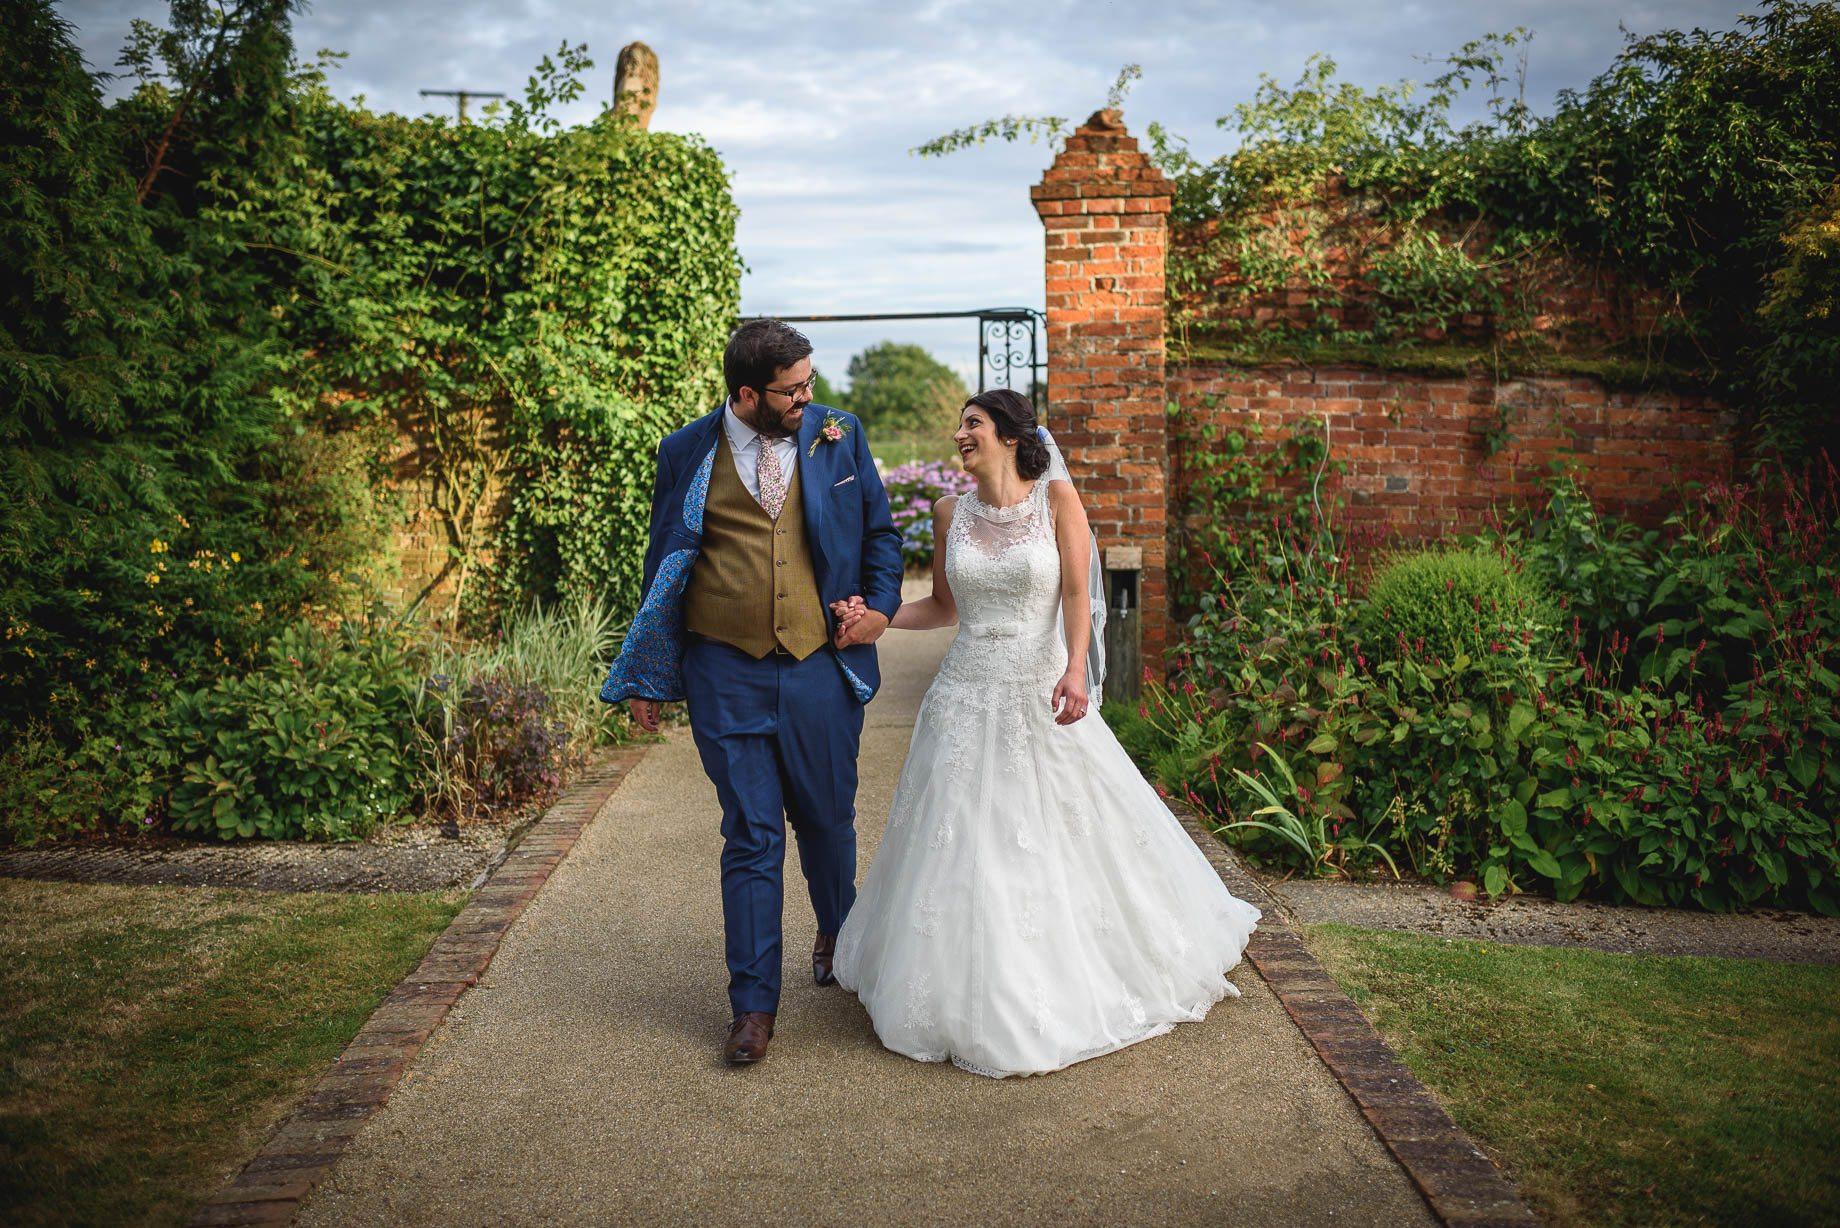 Gaynes Park wedding photography - Guy Collier Photography - Rachel and Jon (152 of 169)